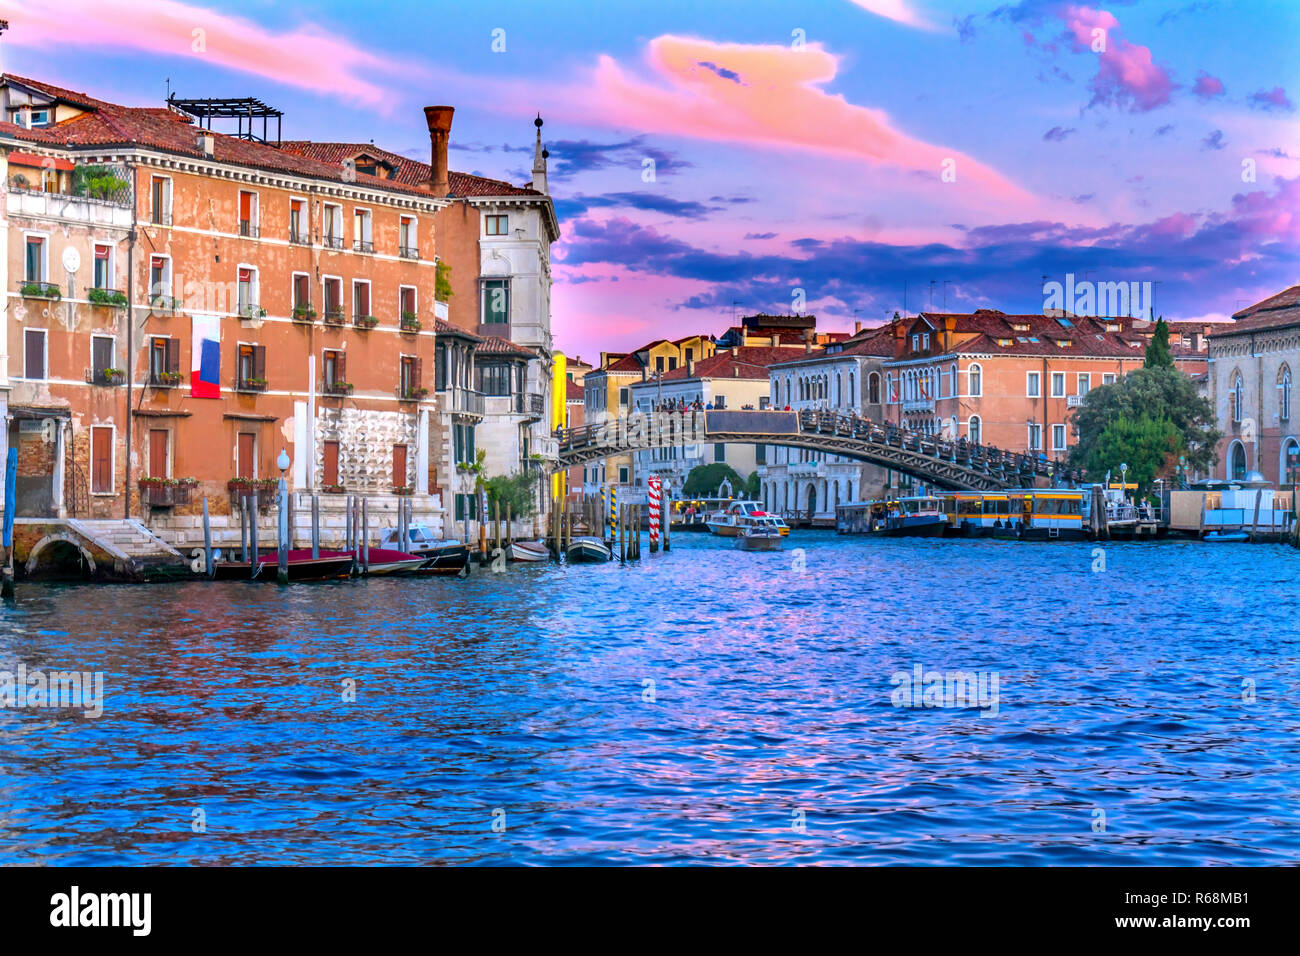 Ponte dell Academia Bridge Sunset Grand Canal Venice Italy Stock Photo